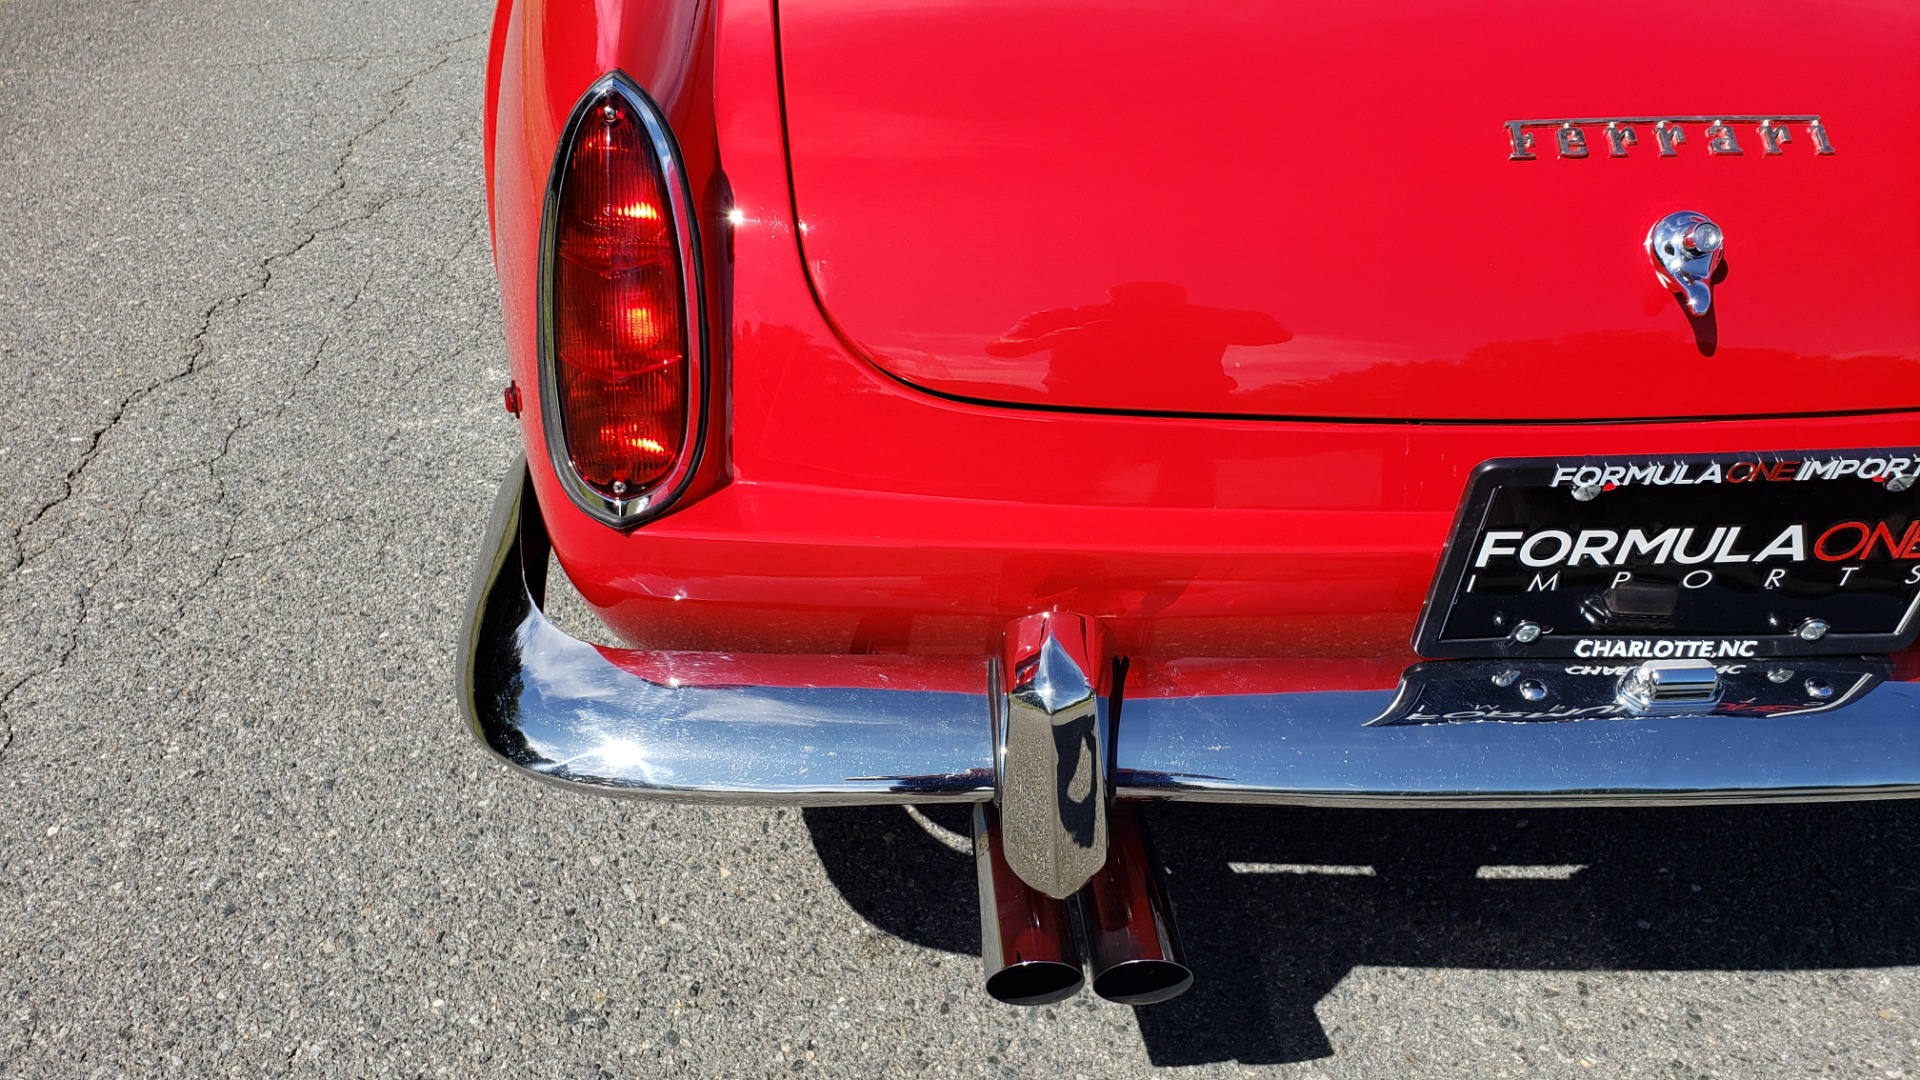 Used 1961 Ferrari 250GT SWB CALIFORNIA REPLICA / 302CI V8 / TREMEC 5-SPEED for sale Sold at Formula Imports in Charlotte NC 28227 51